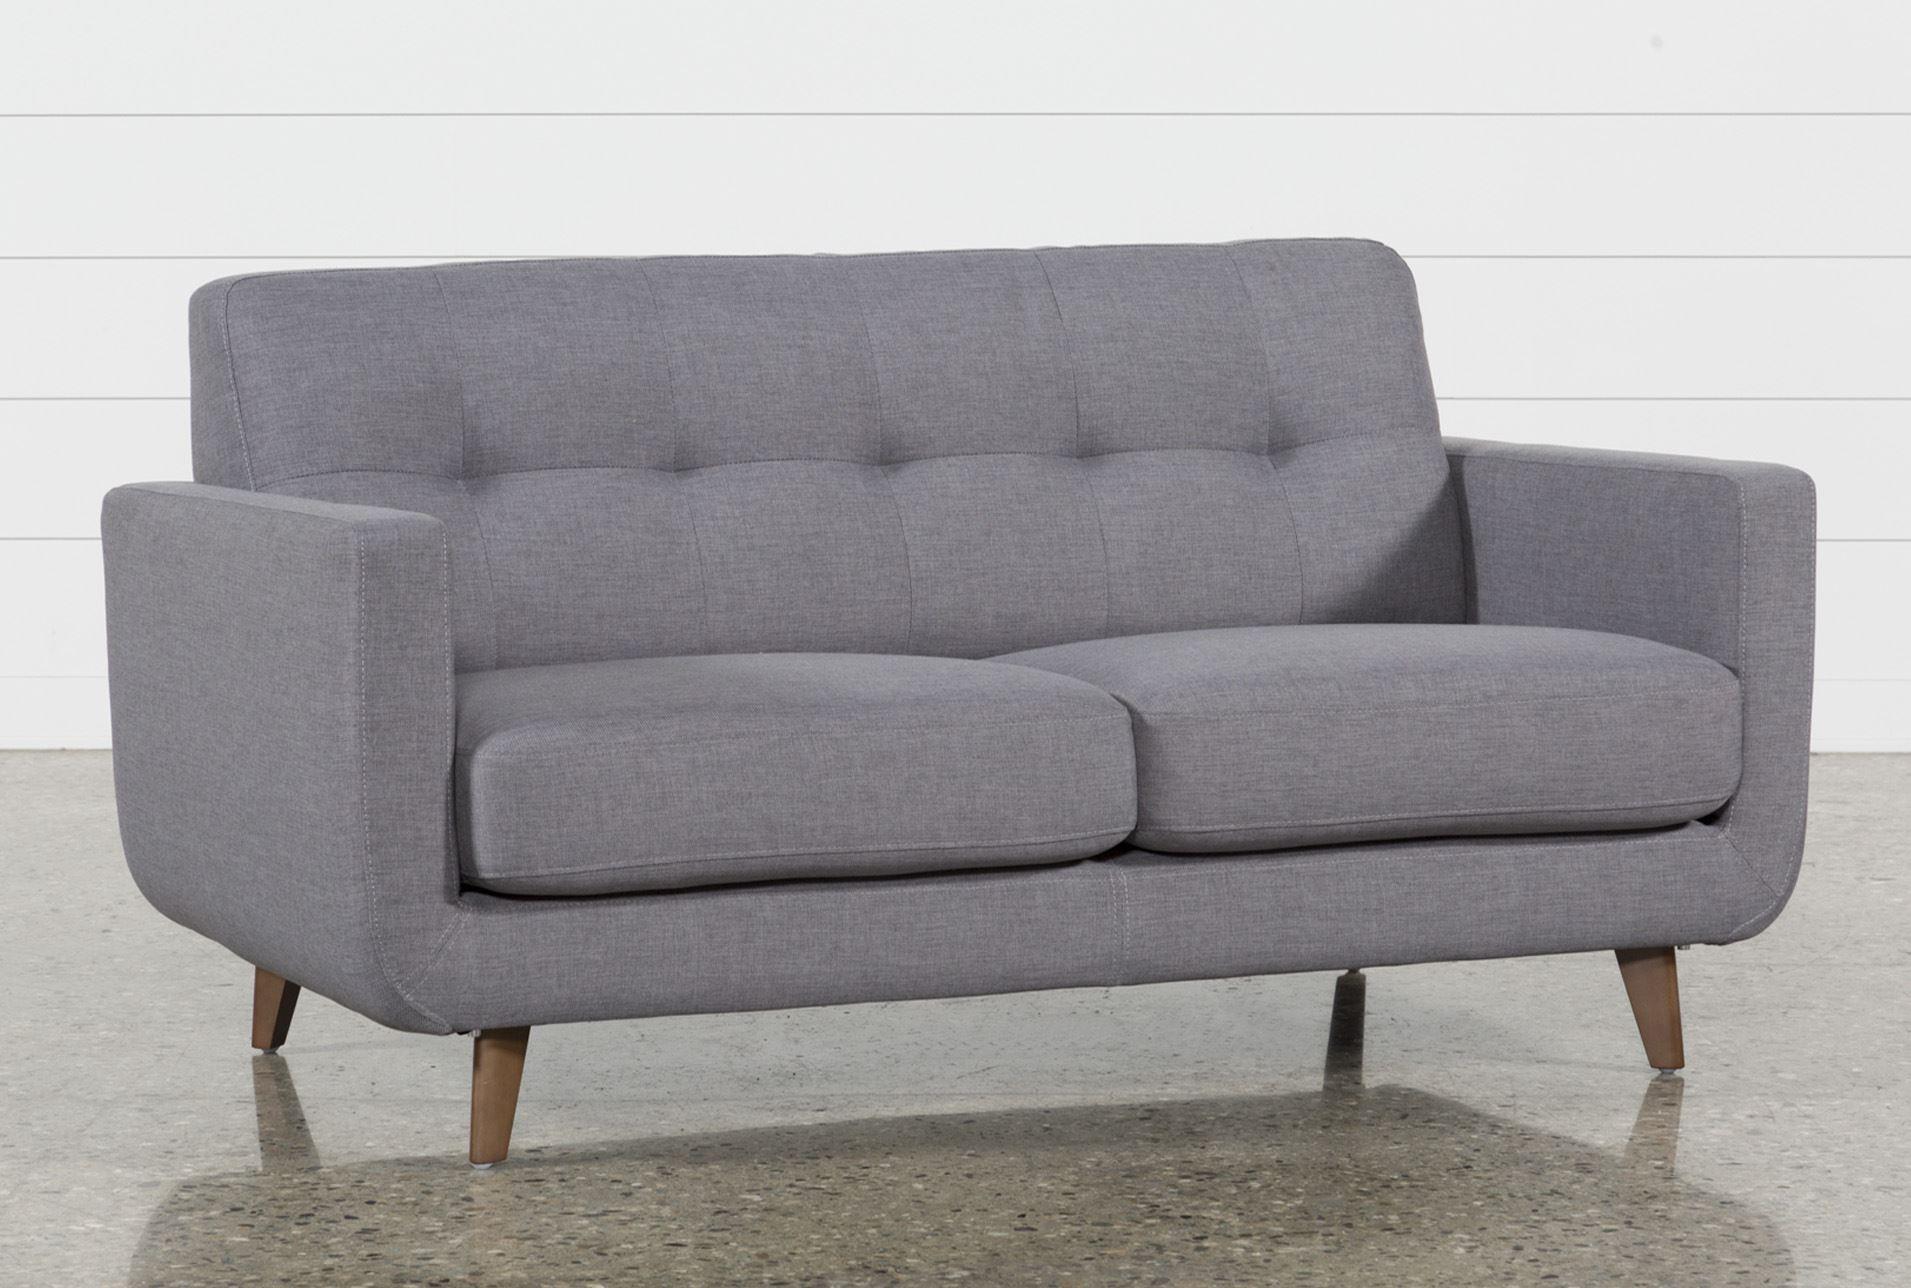 Incredible Allie Dark Grey Twin Plus Sleeper Sofa Products Sleeper Dailytribune Chair Design For Home Dailytribuneorg